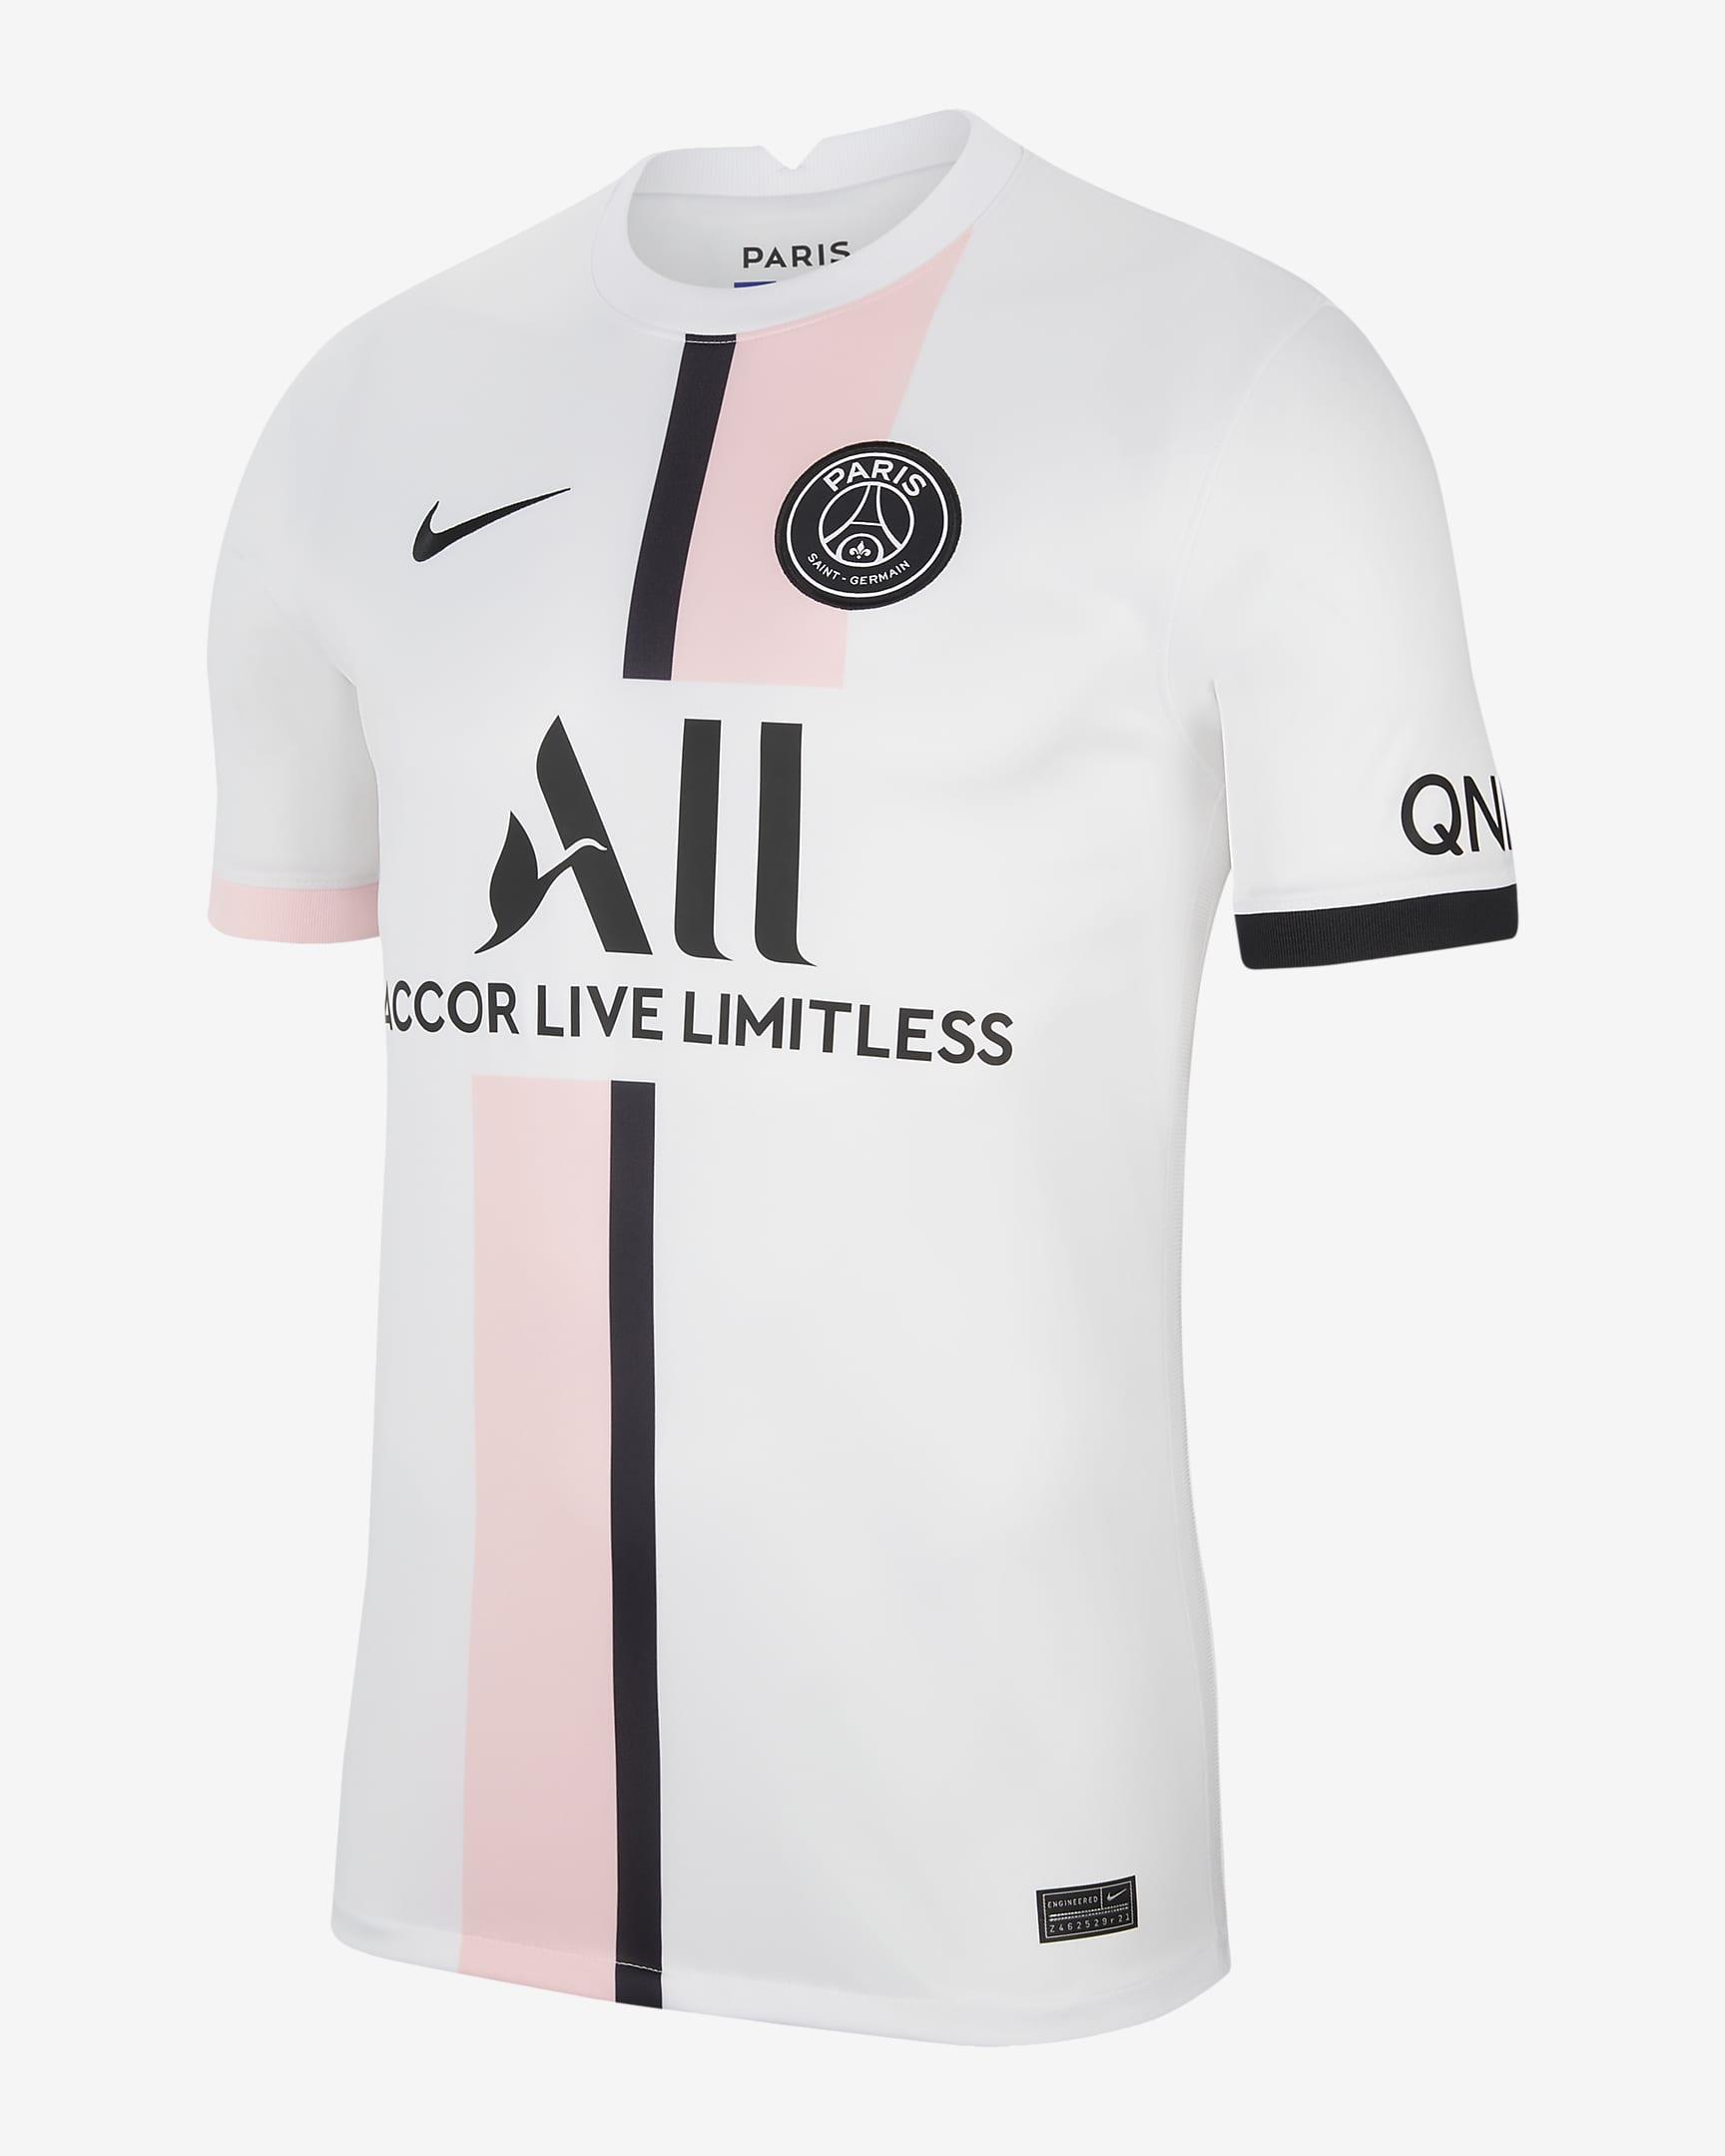 Maillot de foot Paris Saint-Germain Extérieur (Away Kit) 2021/22